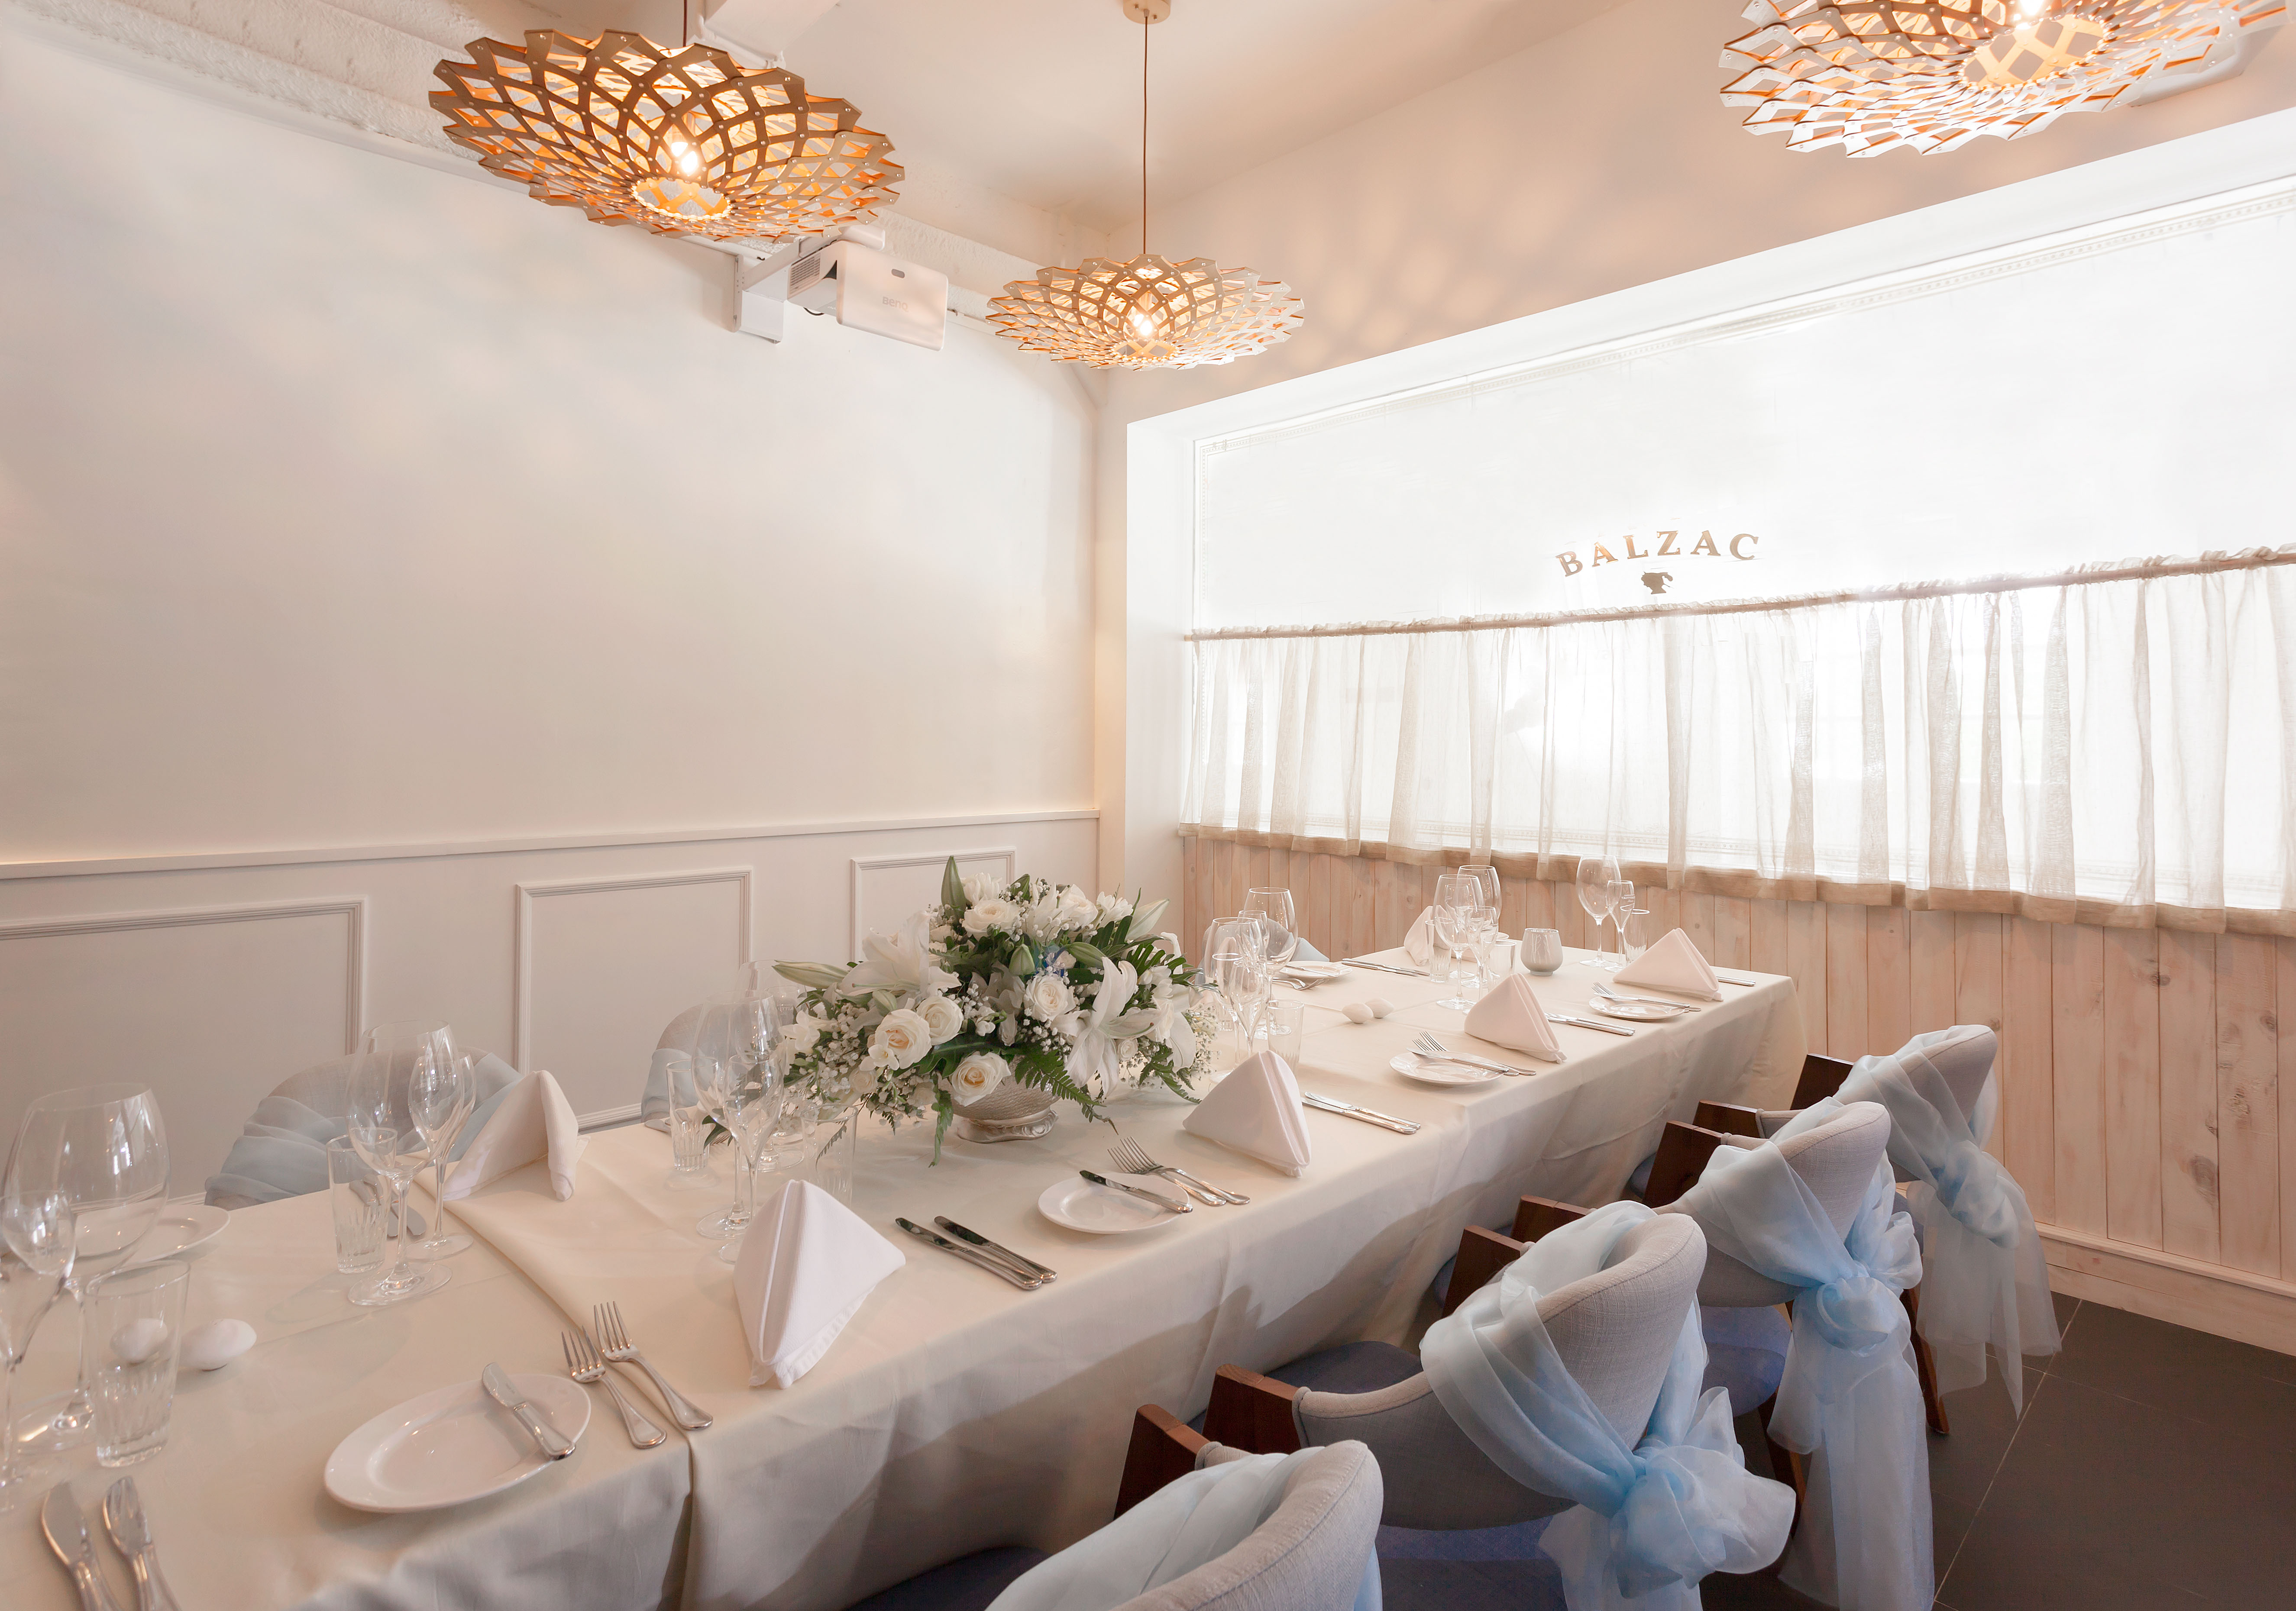 Balzac-Brasserie-Bar-fort-venuerific-blog-wedding-setup